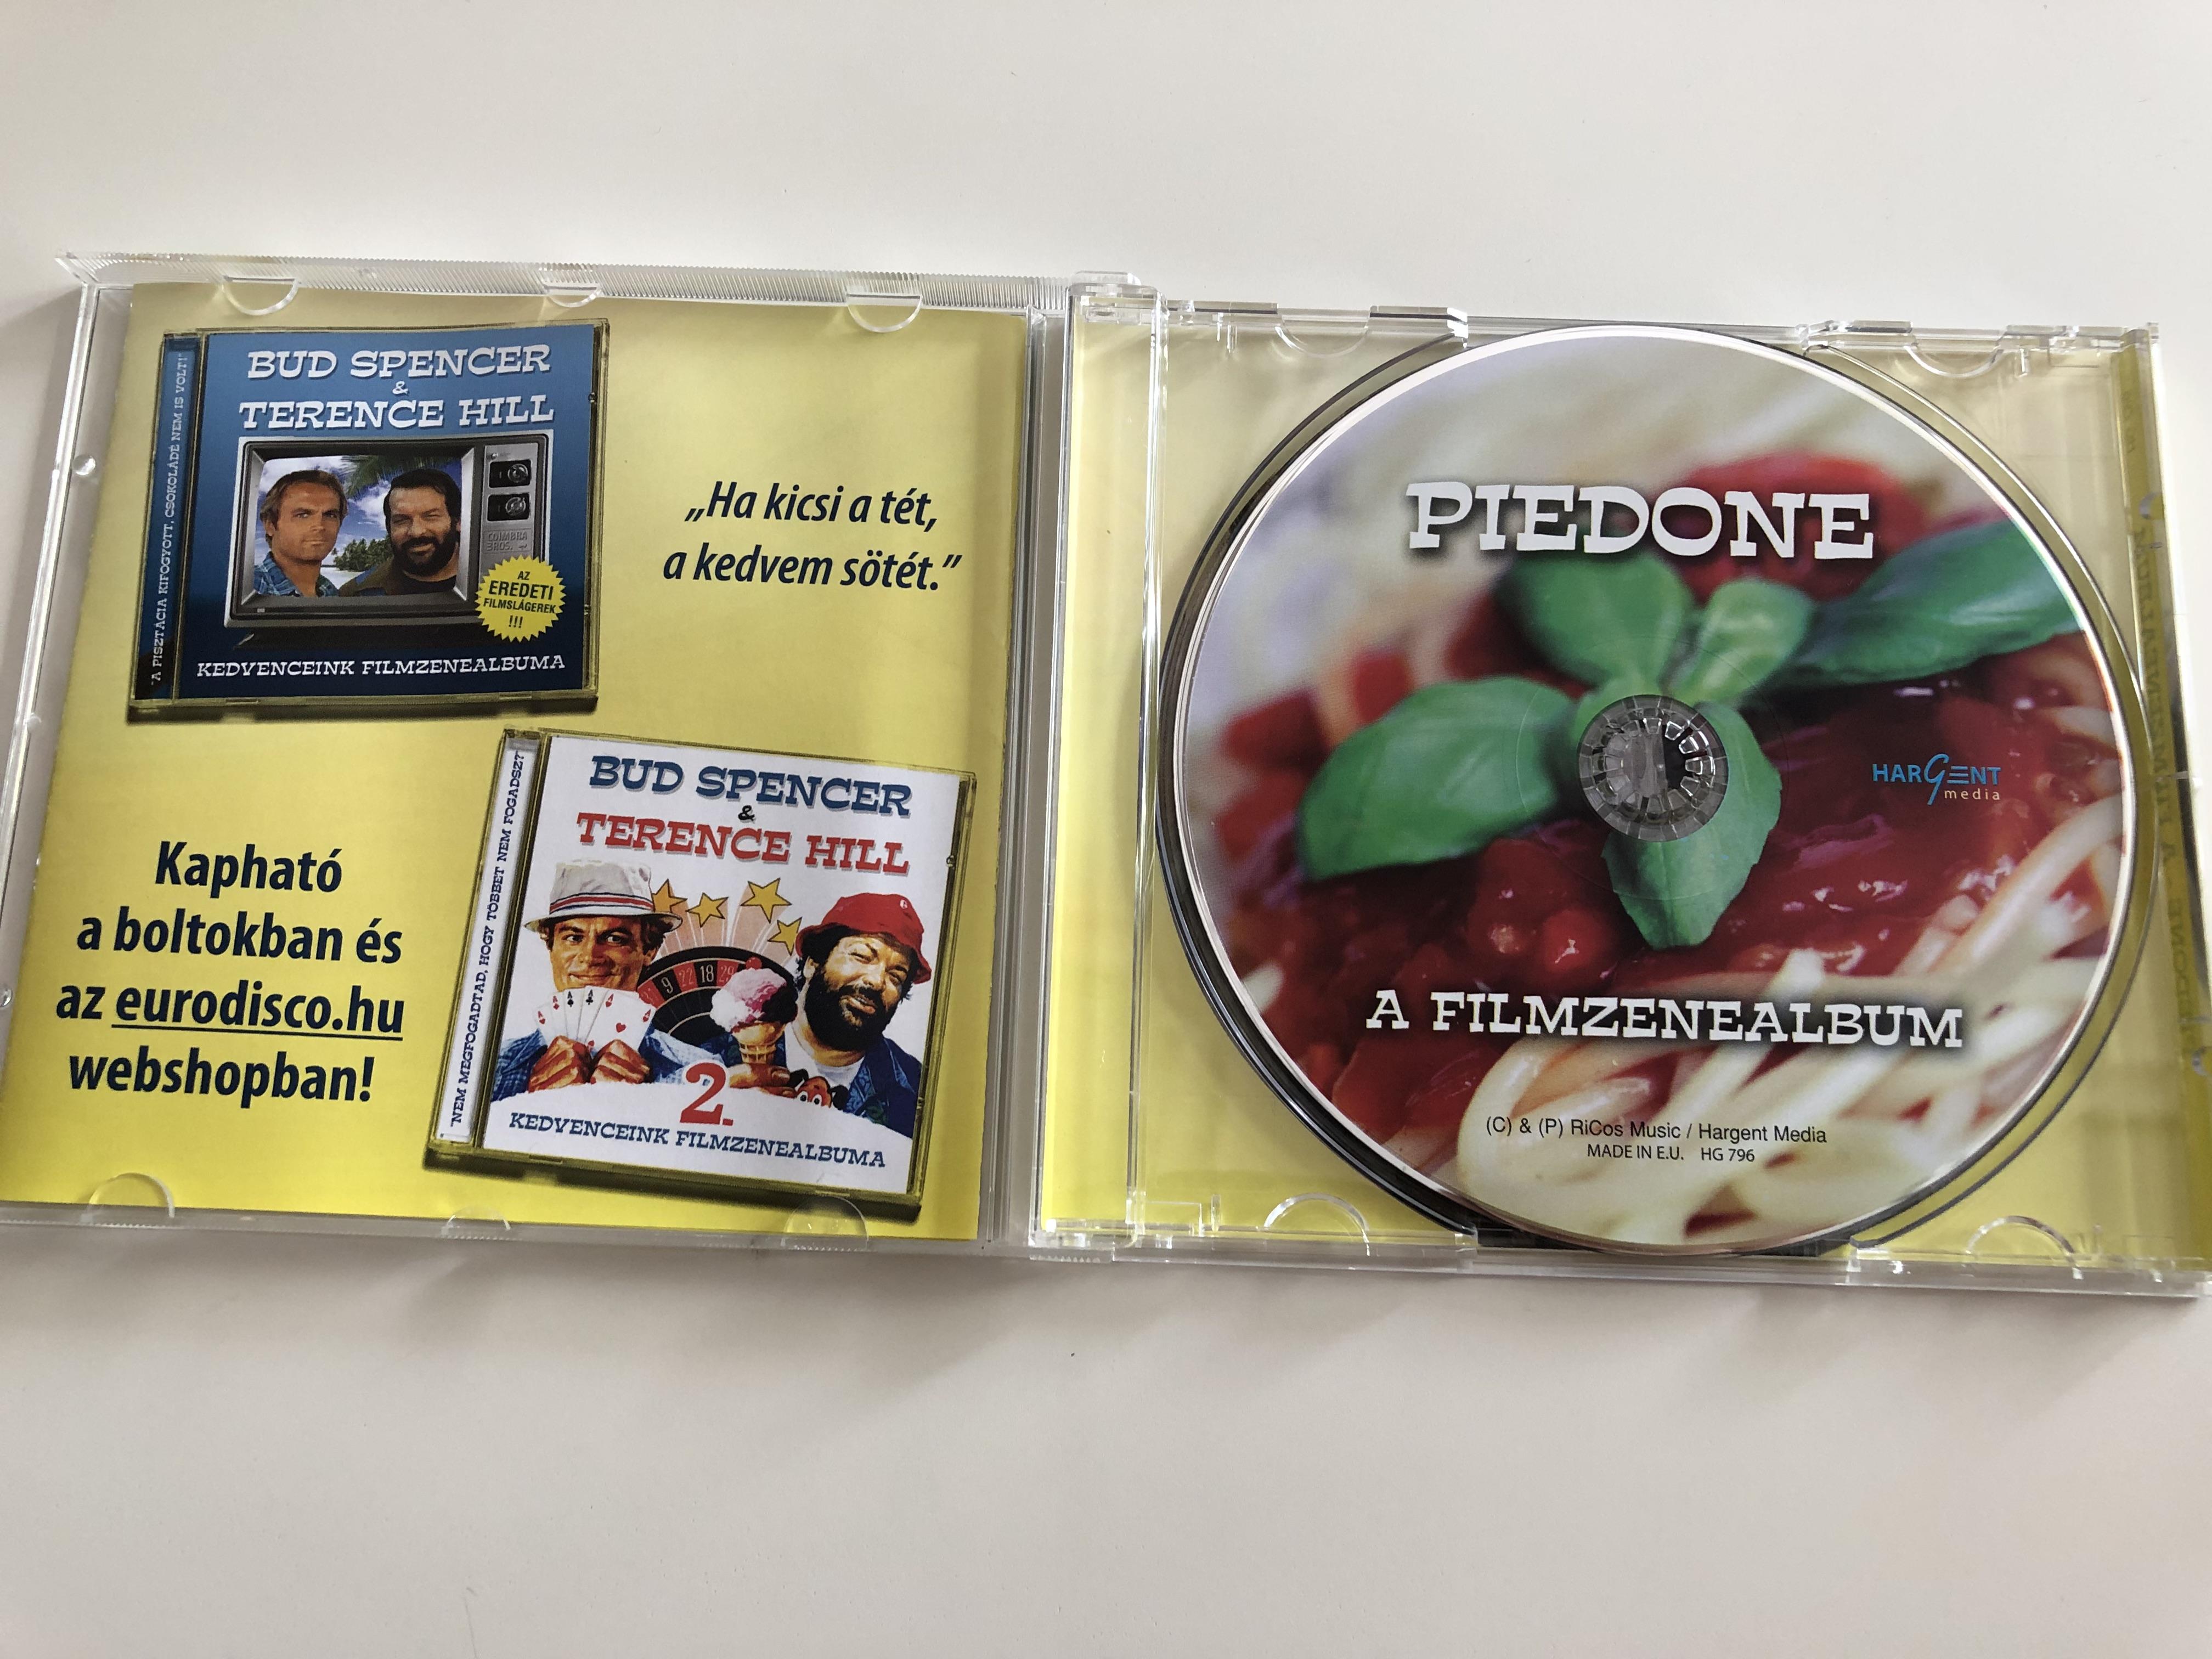 piedone-a-filmzene-album-piedone-movies-official-soundracks-a-piedone-filmek-eredeti-zen-i-piedone-a-zsaru-piedone-hongkongban-piedone-afrik-ban-piedone-egypitomban-audio-cd-hg796-6-.jpg